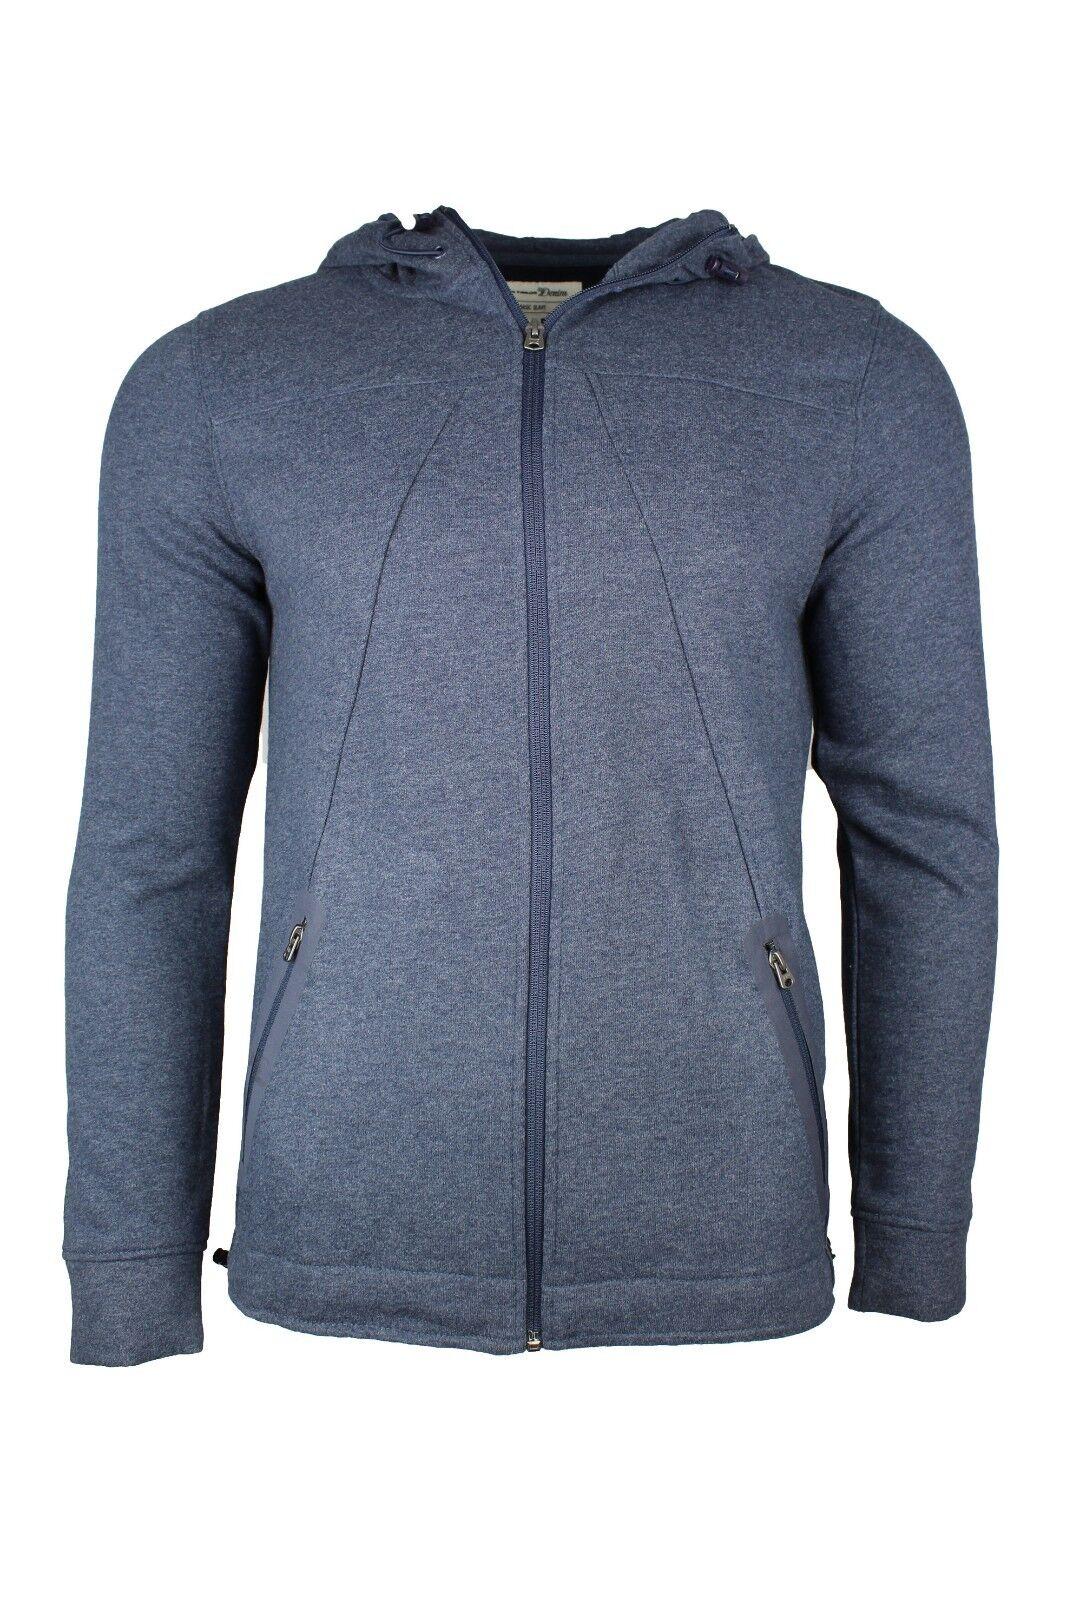 Neu TOM TAILOR Denim Herren Sweatshirt Sportive Sweatjacket 2f1be2ffd0